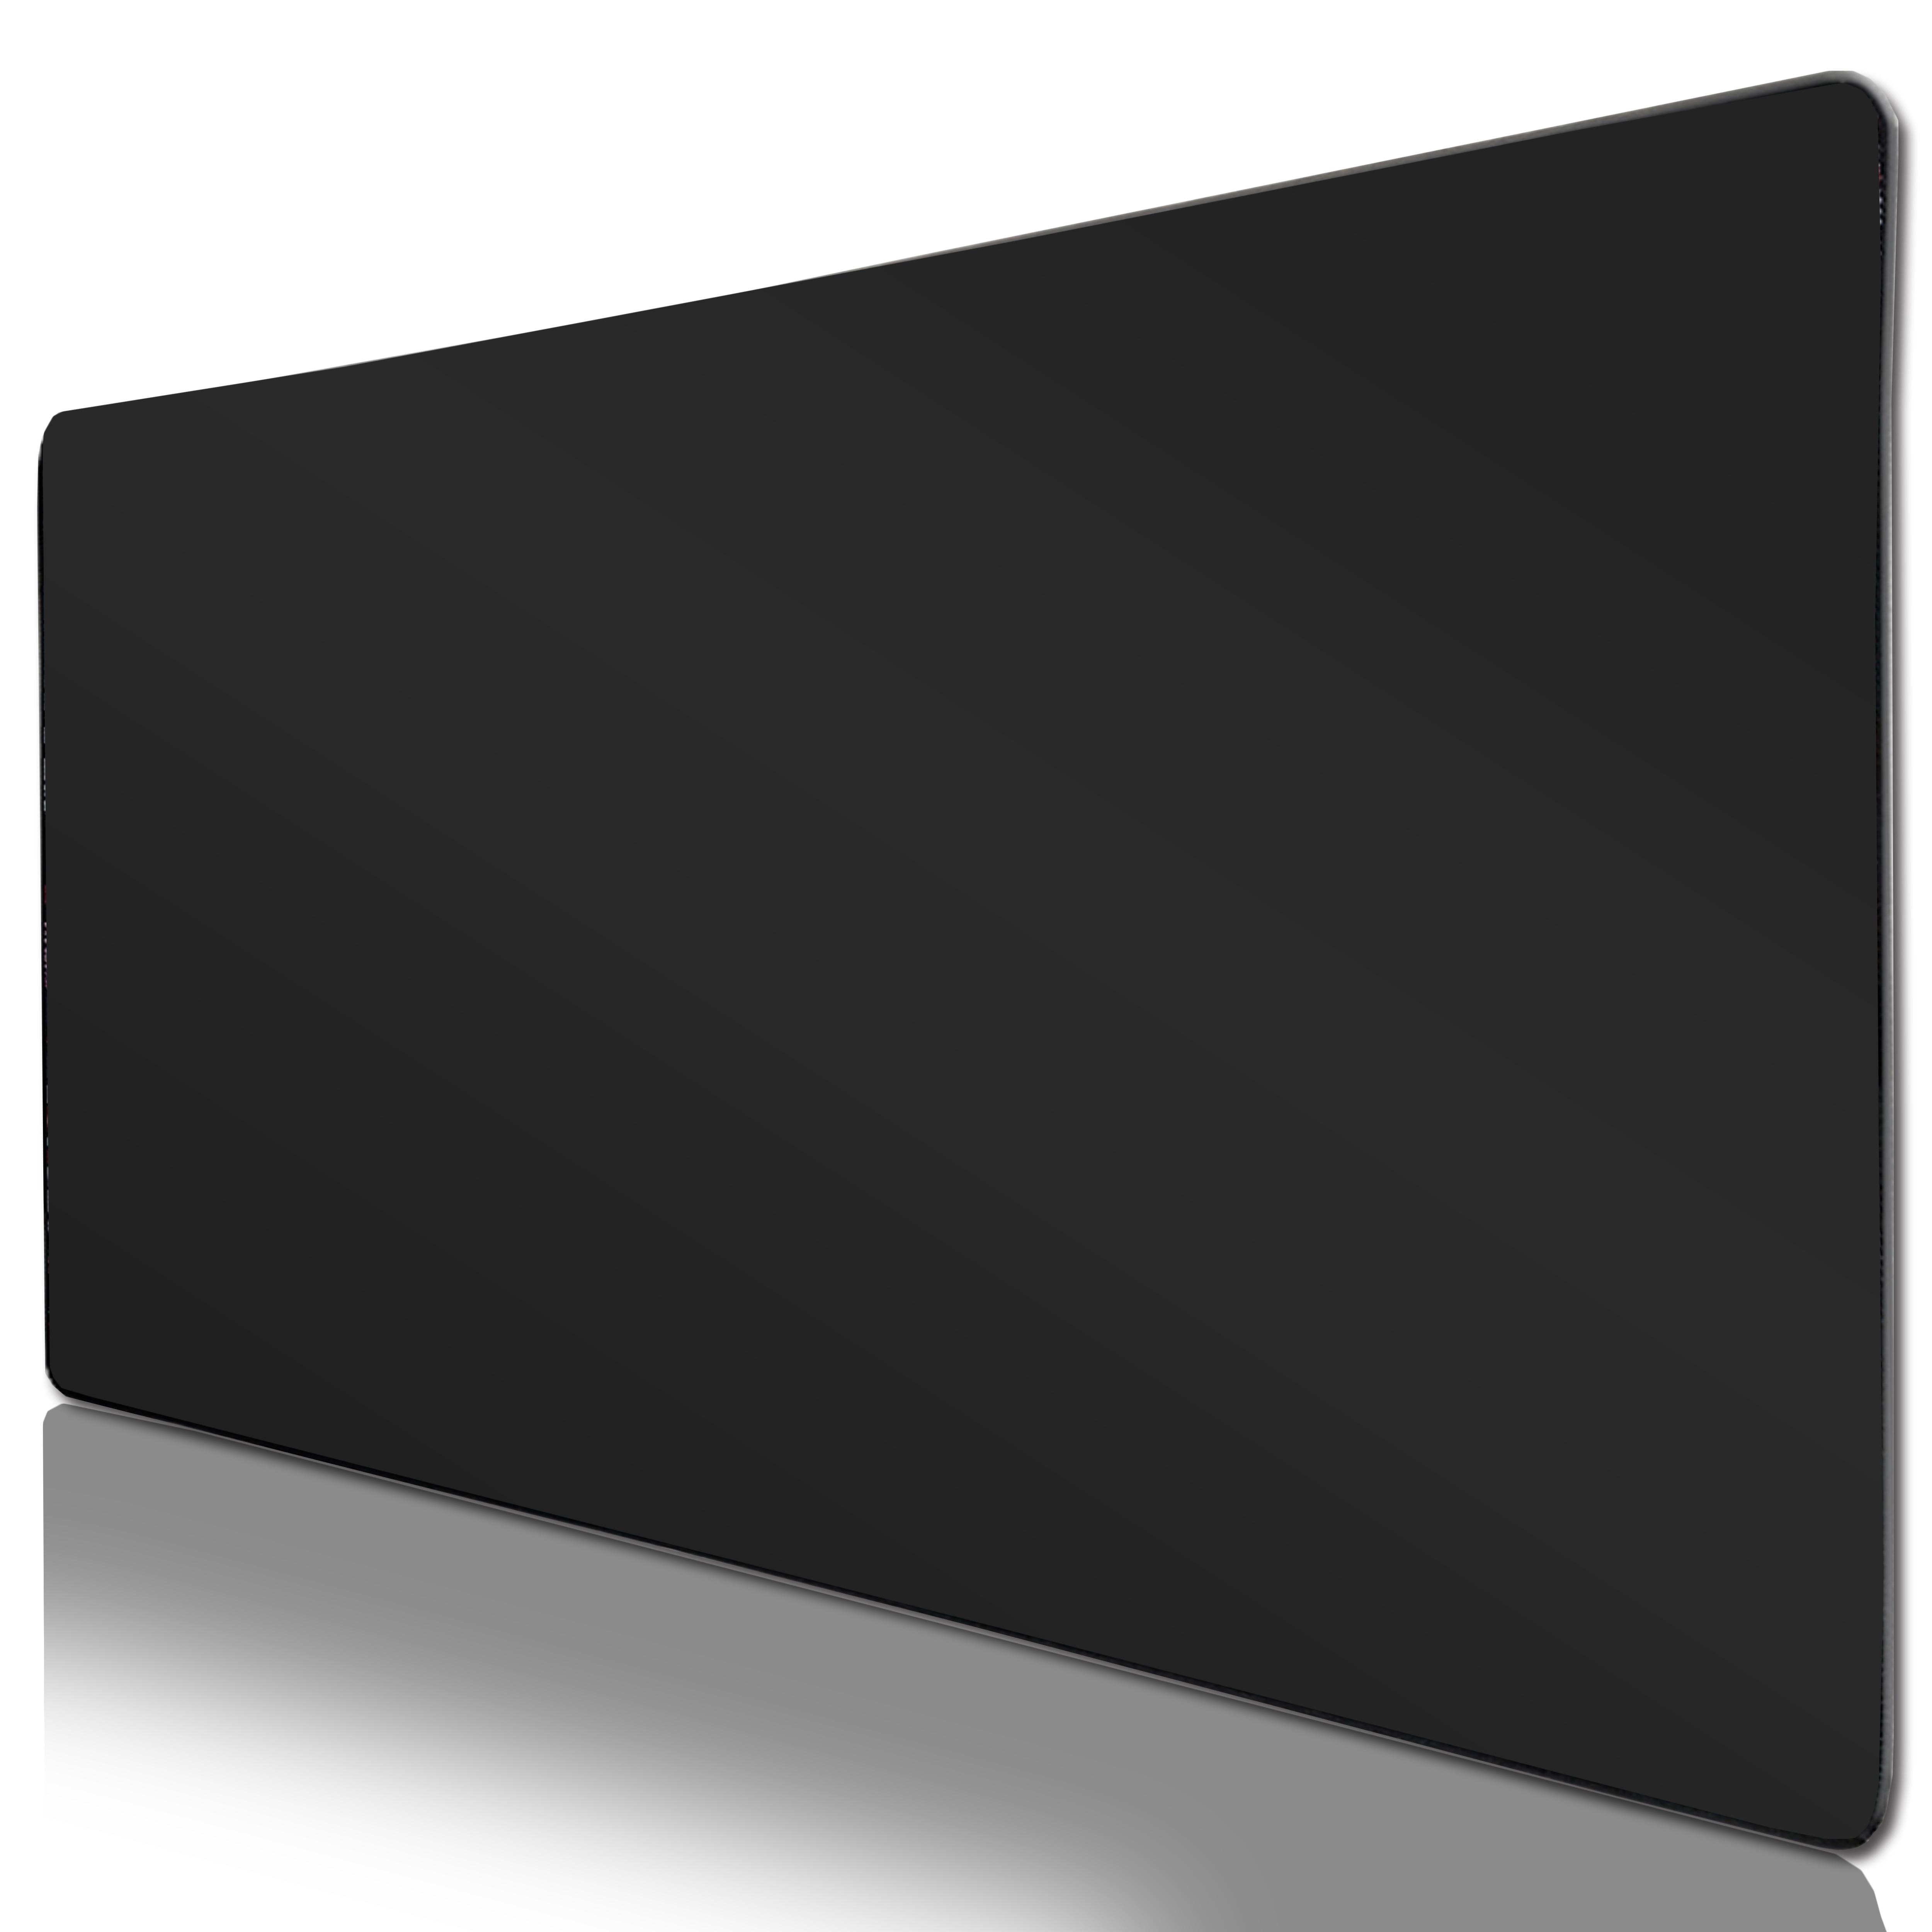 ZUOYA Mouse Pad Gaming Large Size Mousepad Gamer Big Computer Mat Office Desk Mat Keyboard Rubber No-slip For Gamer Game